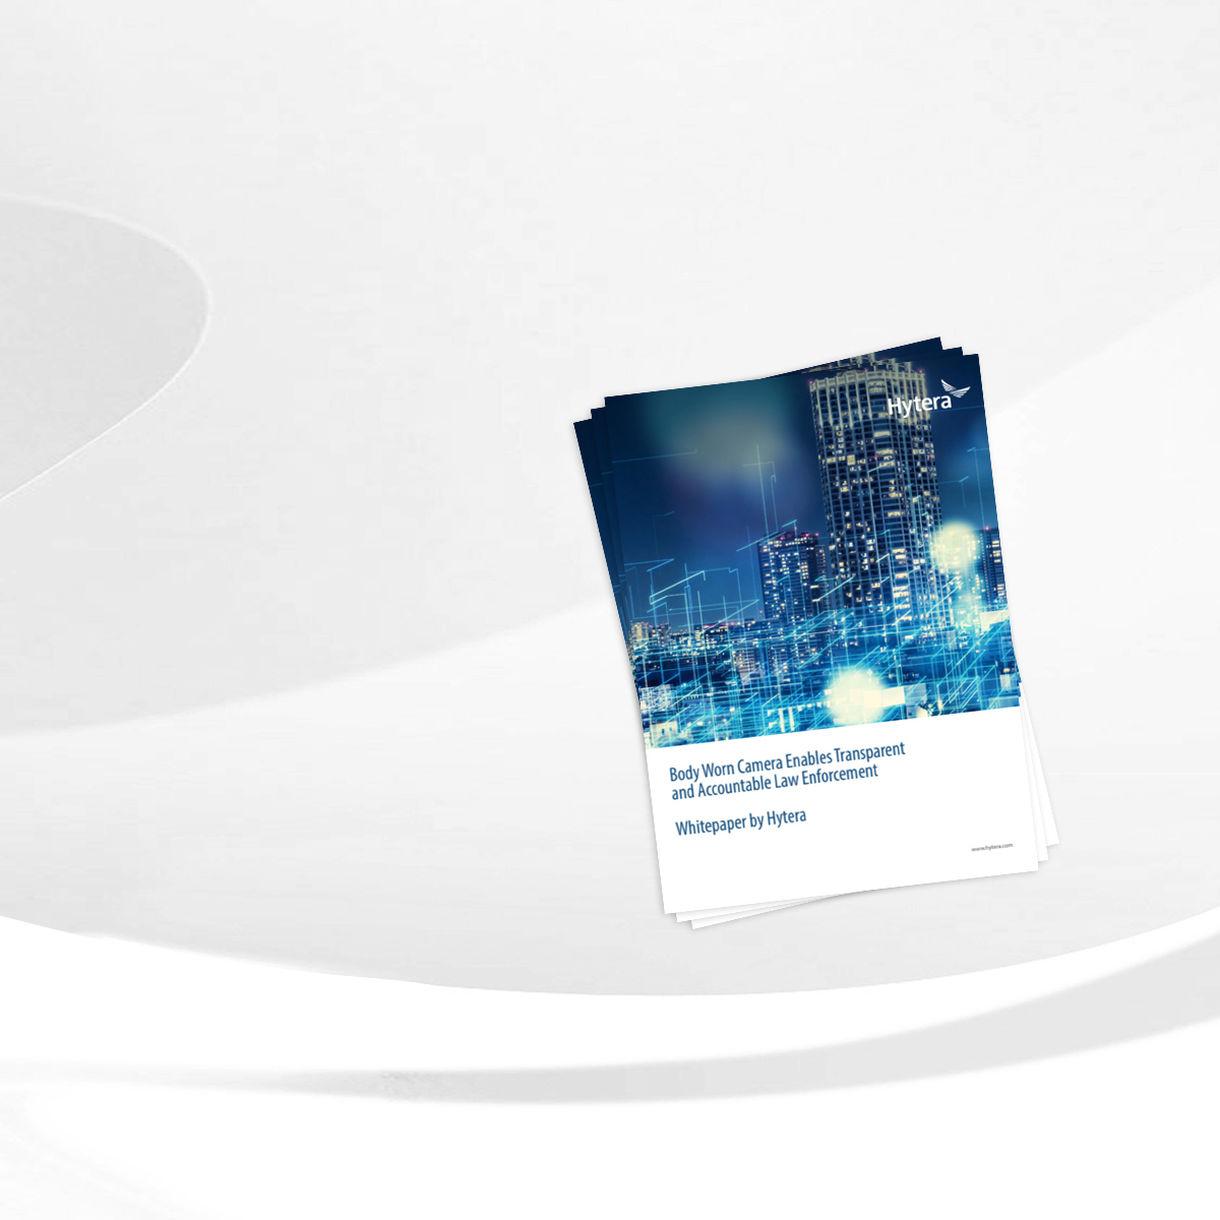 Bwc whitepaper